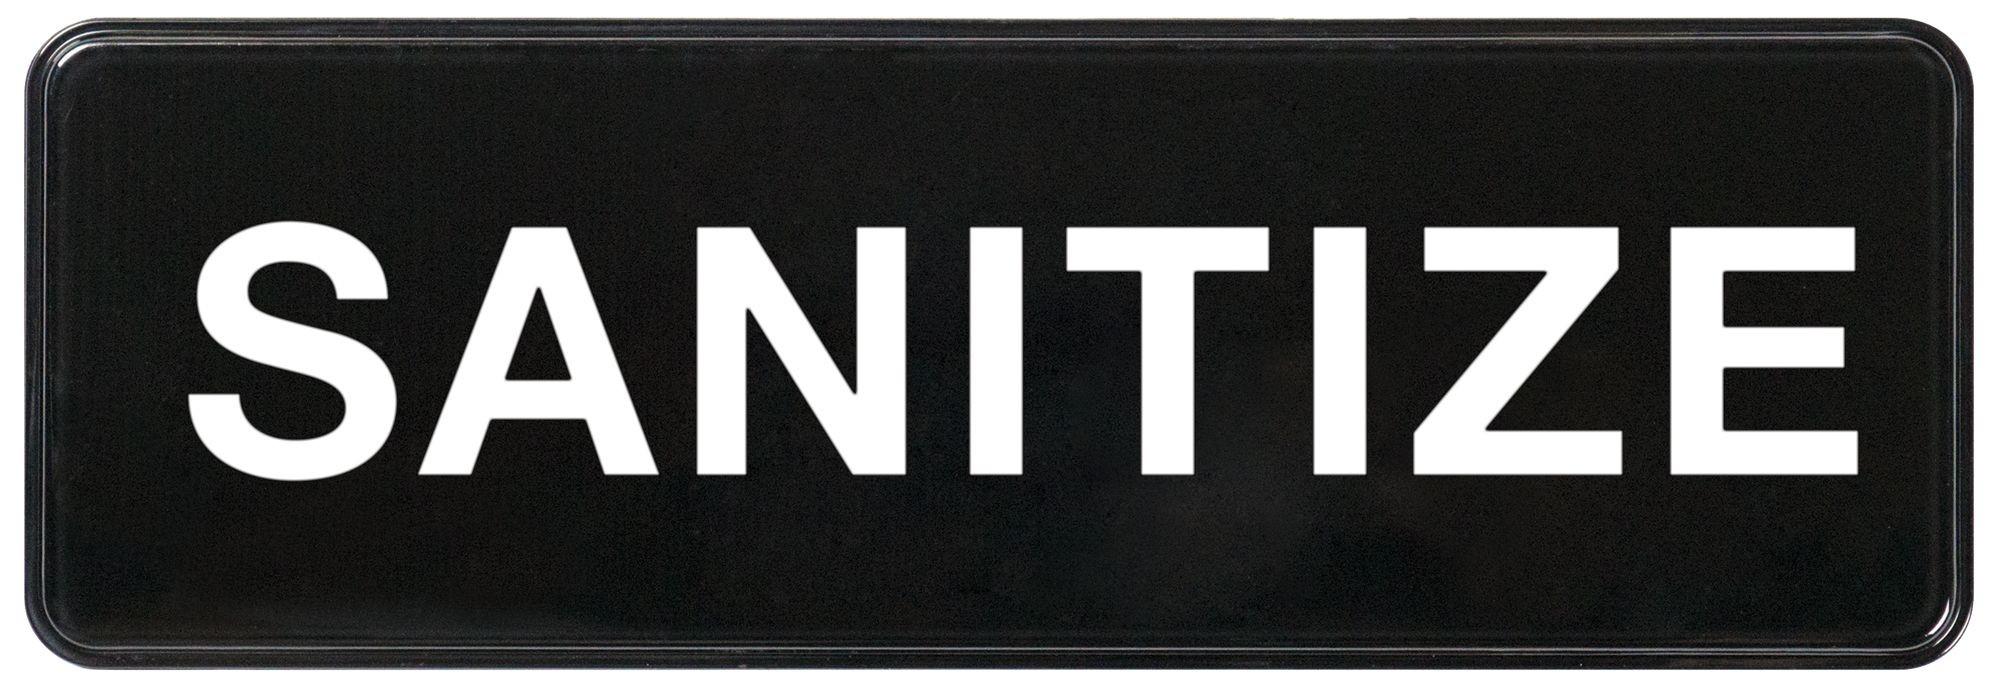 "Winco SGN-329 Black ""Sanitize"" Information Sign, 3"" x 9"""